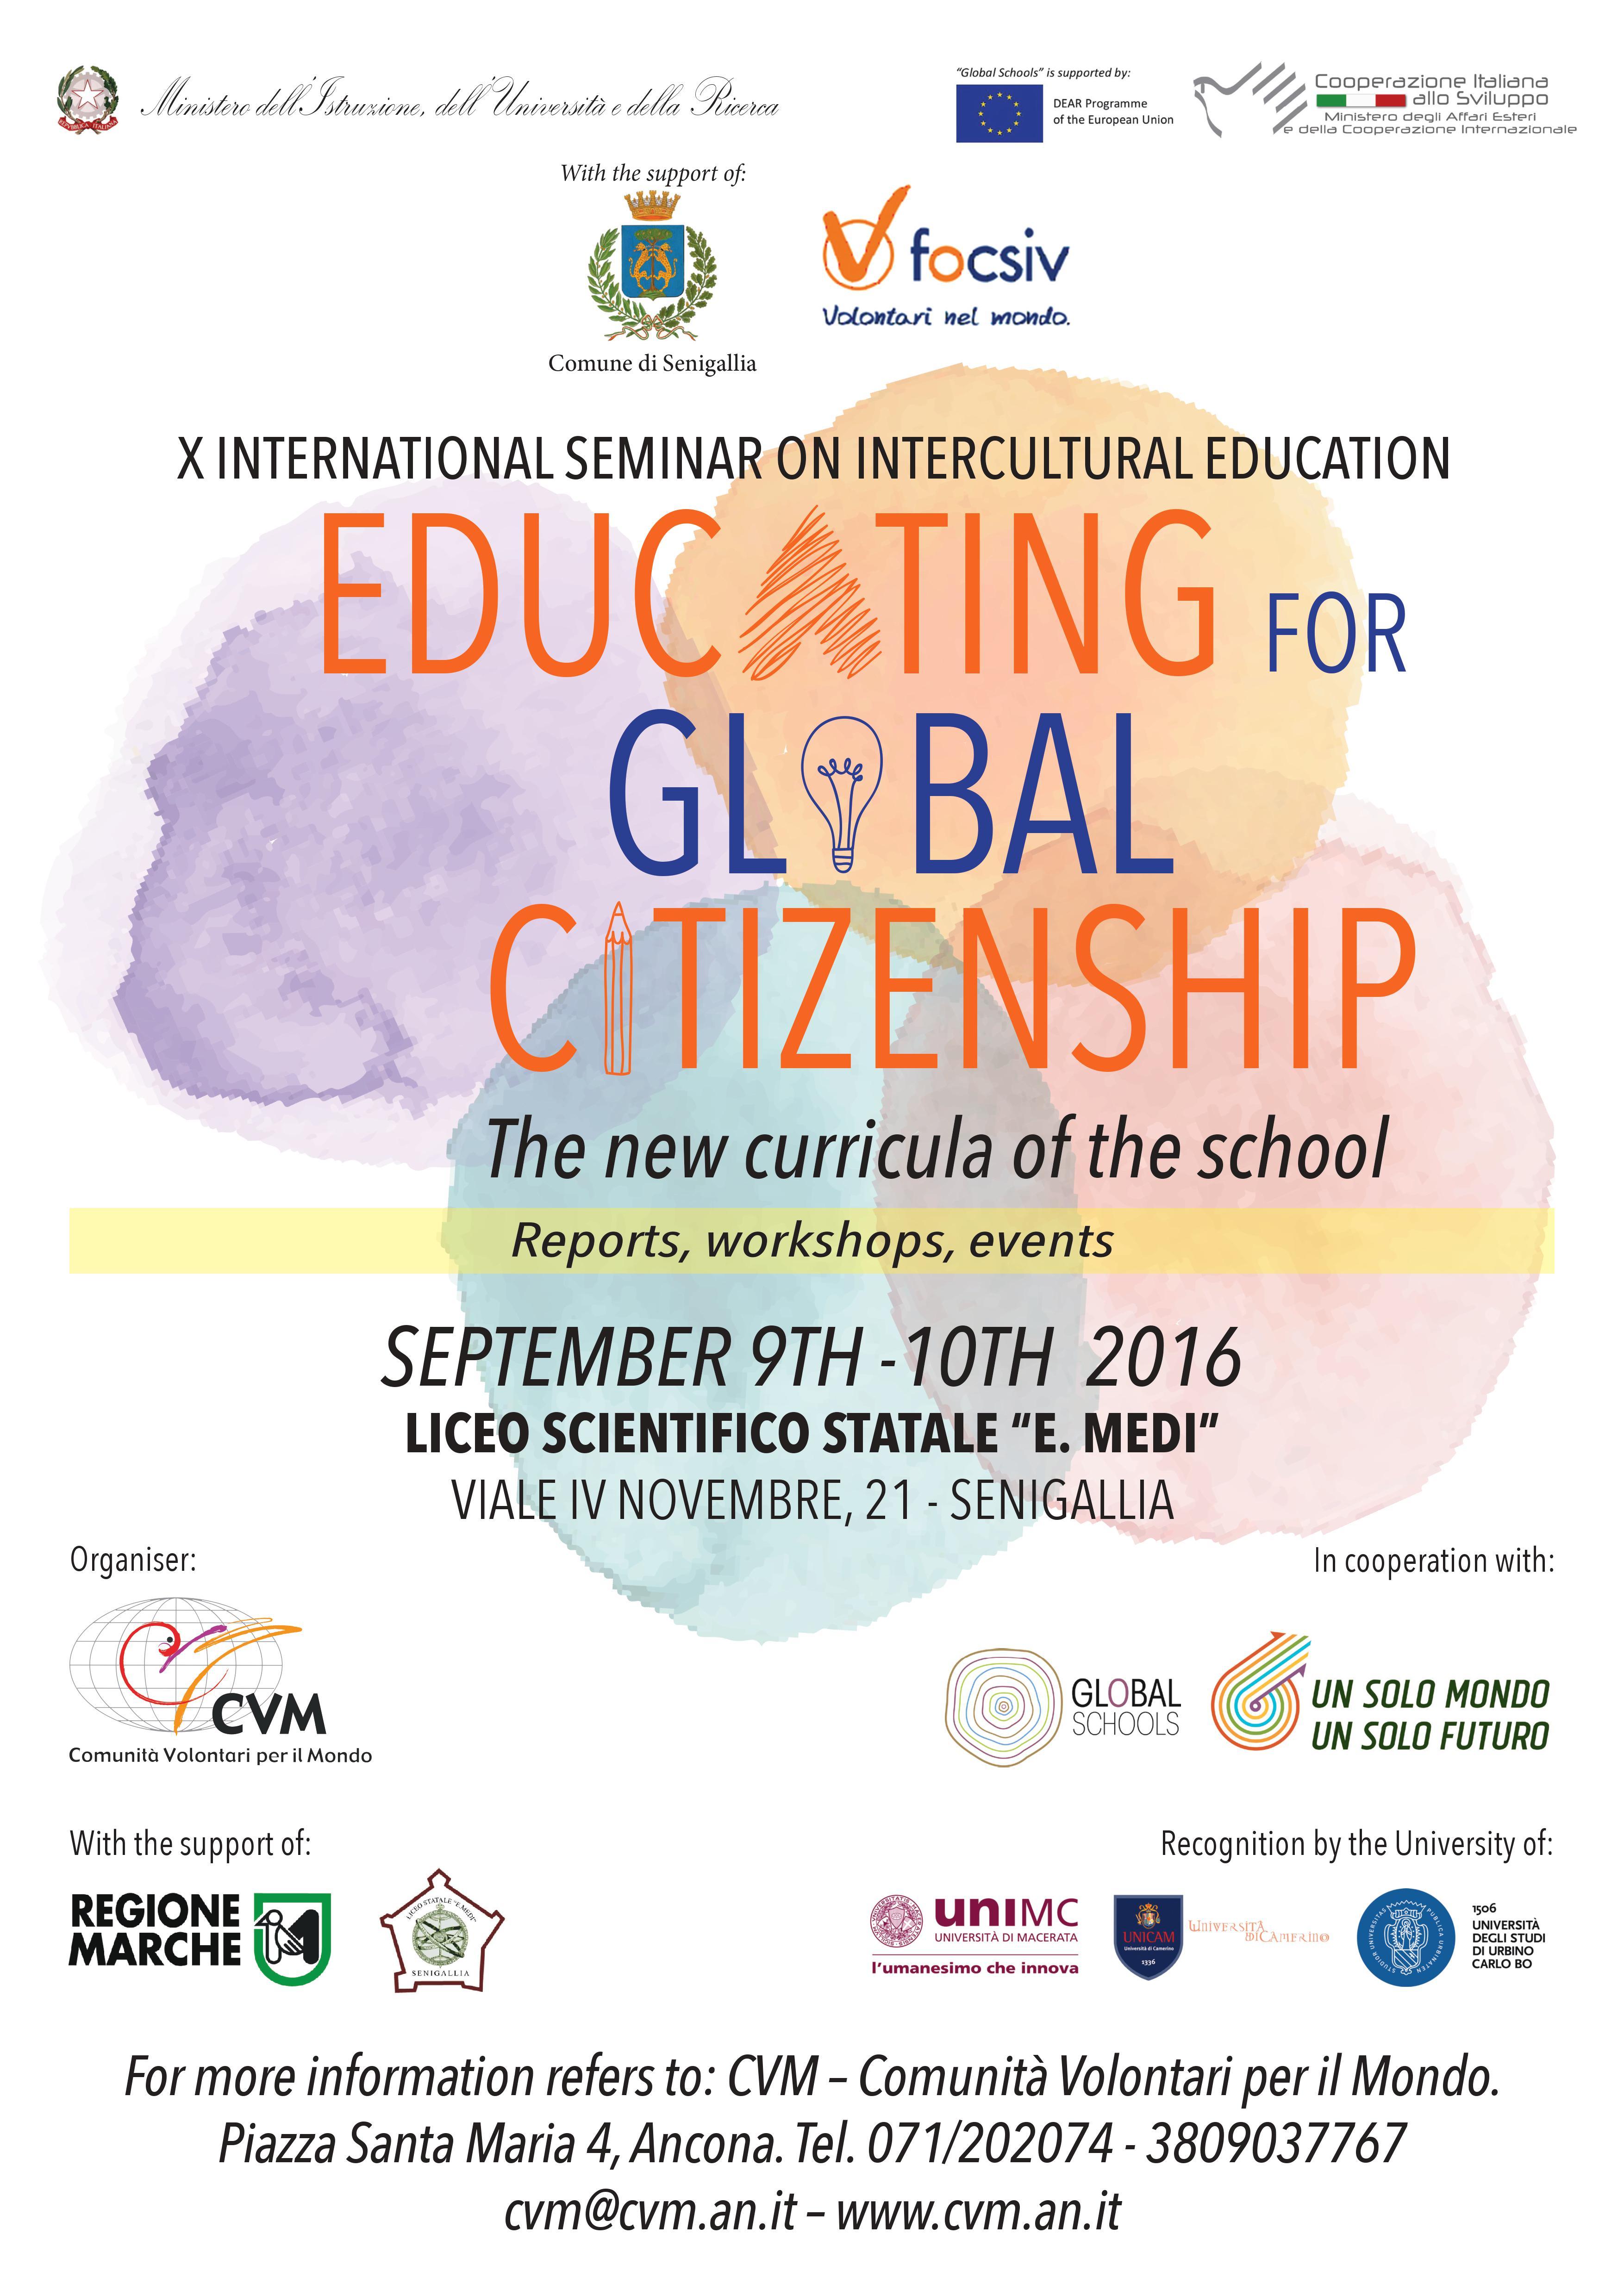 Manifesto - X International Seminar on Intercultural Education